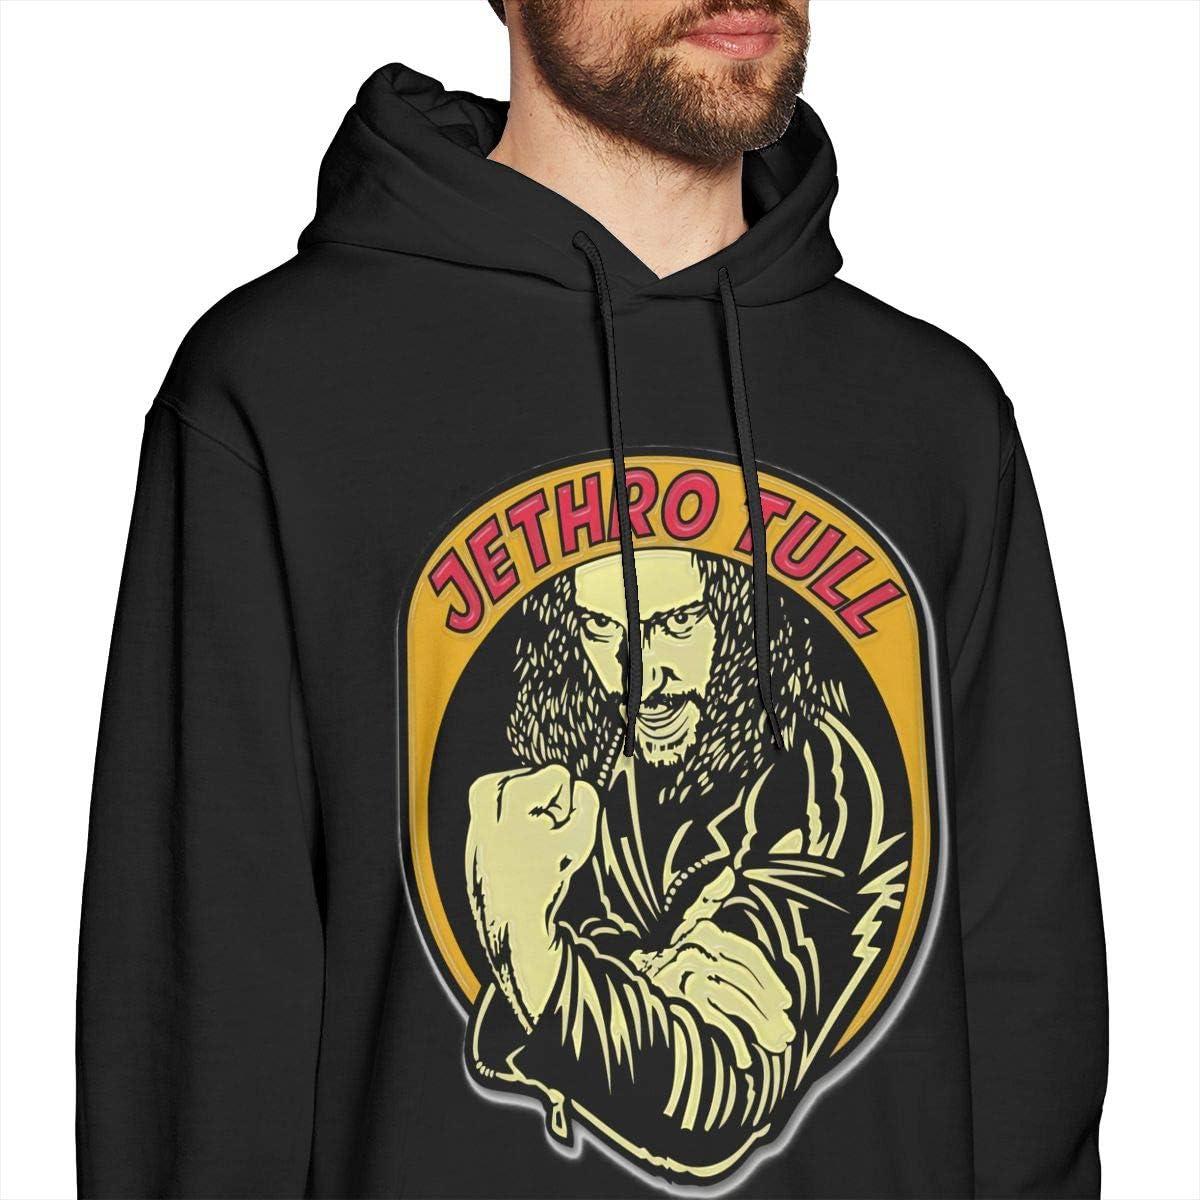 CAMERON MORLEY Jethro/Tull Sweatshirts for Men Hoodies Black